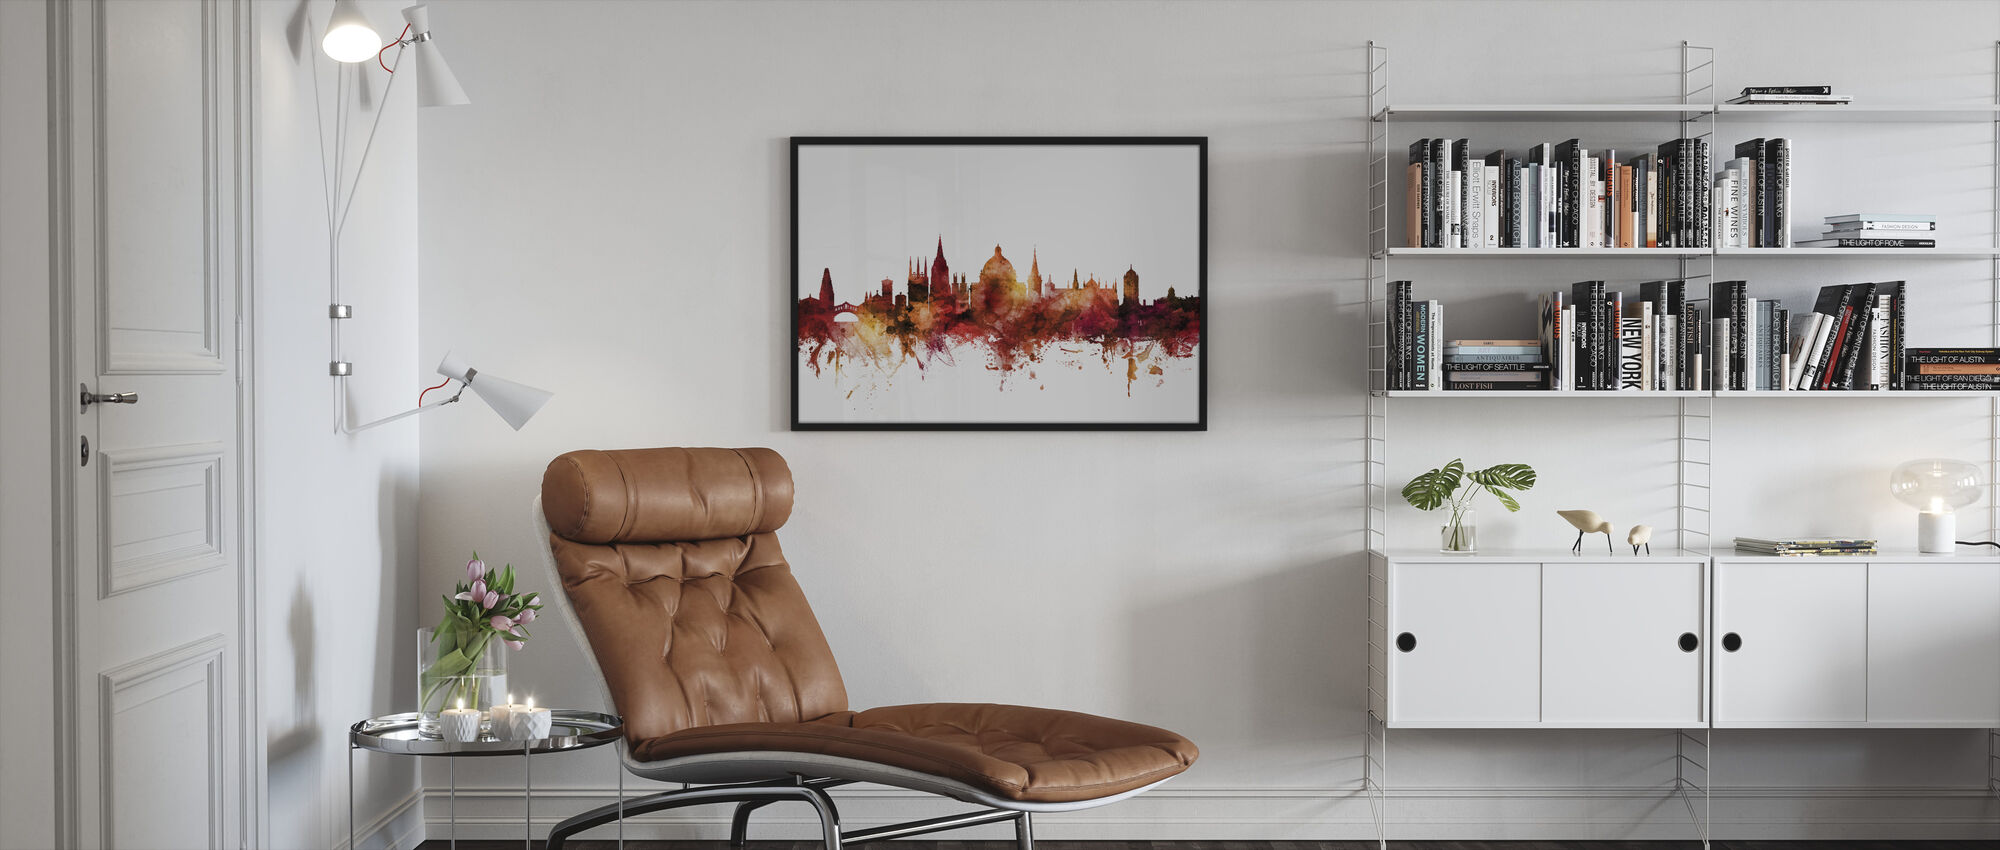 Oxford England Skyline - Framed print - Living Room